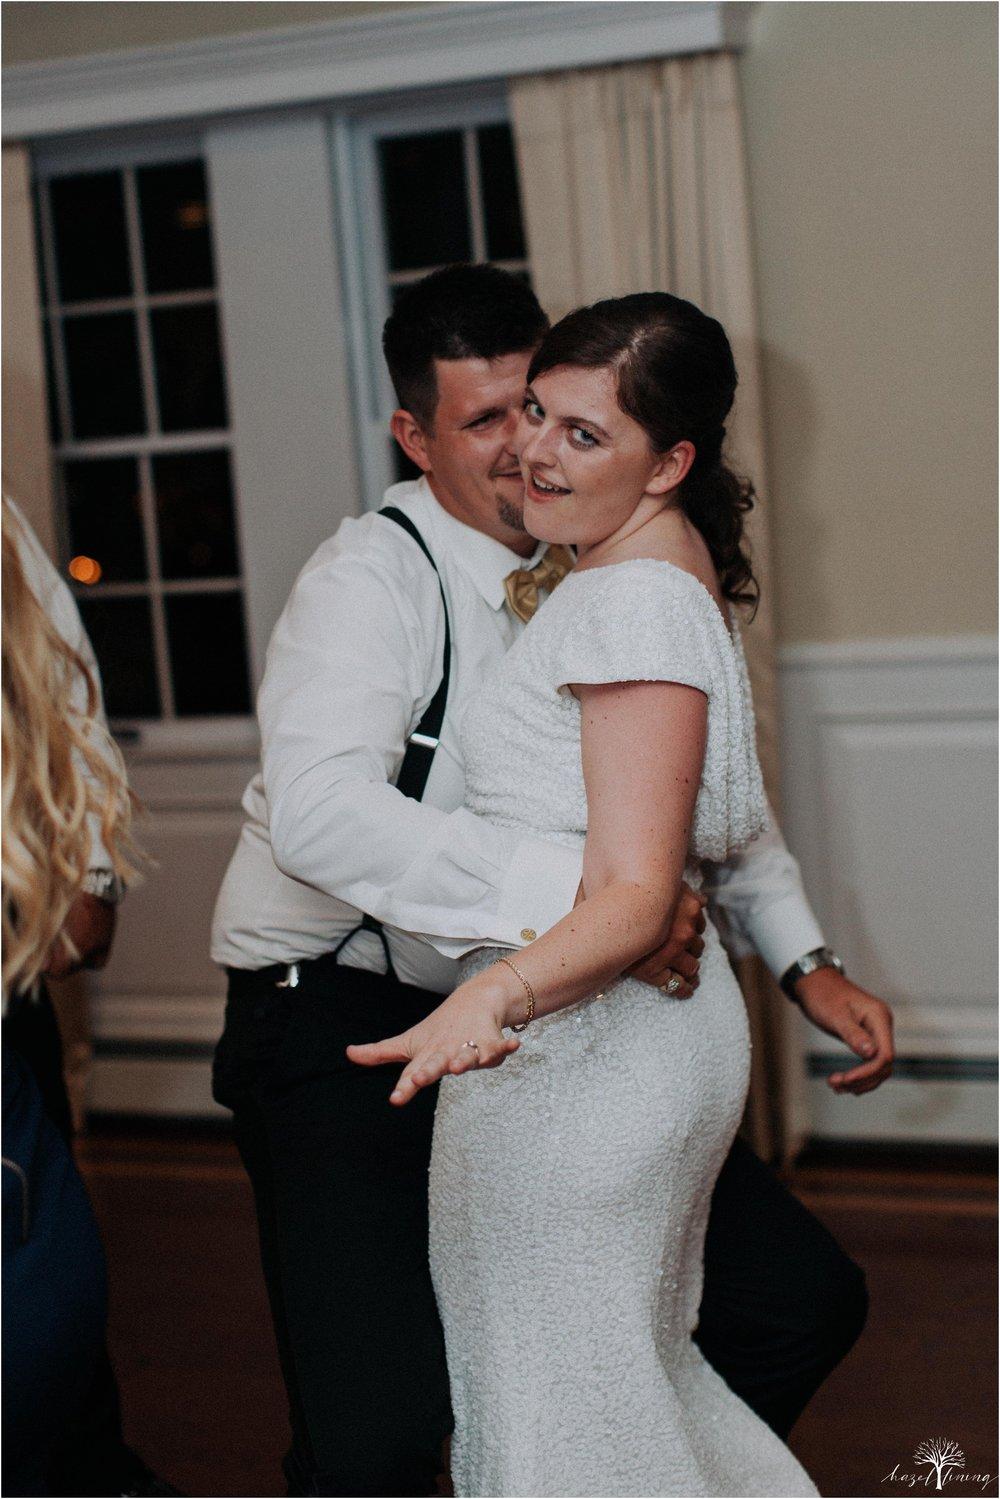 elizabeth-doelp-andrew-foreback-middletown-country-club-summer-langhorne-pennsylvania-wedding-hazel-lining-travel-wedding-elopement-photography_0164.jpg